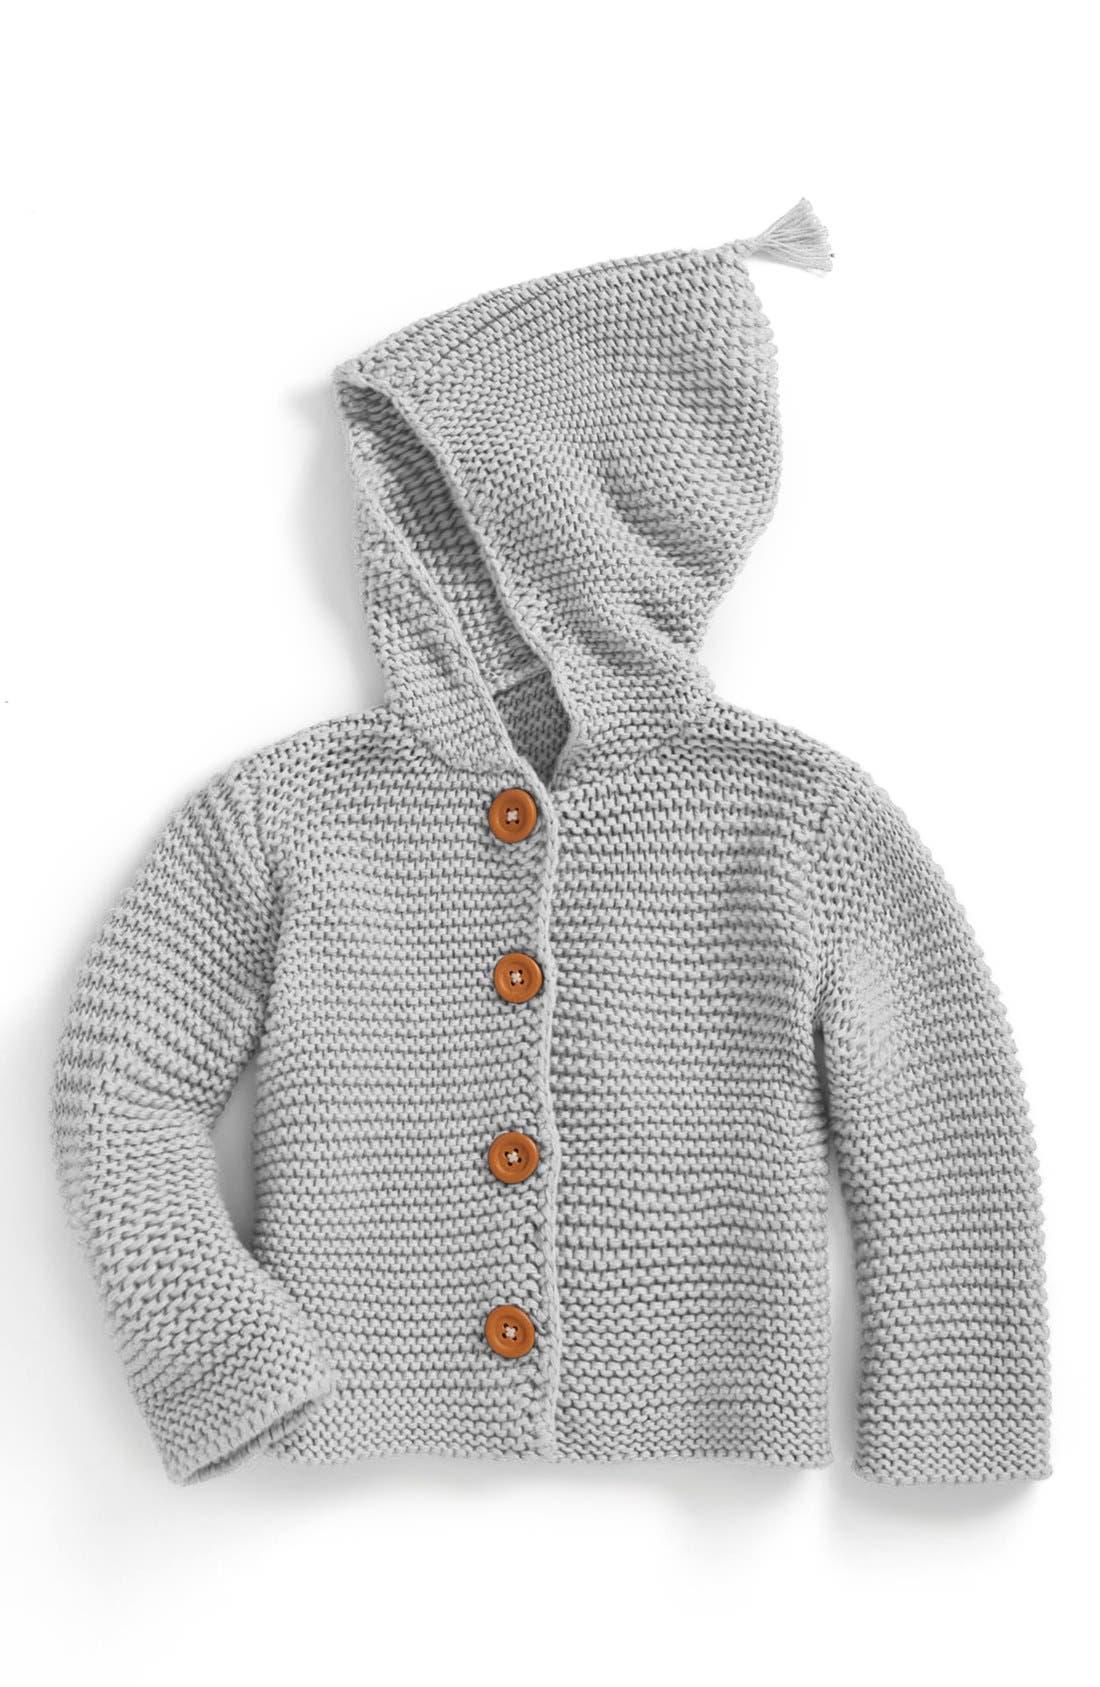 Main Image - Stem Baby 'Lofty' Organic Cotton Hooded Cardigan (Baby)